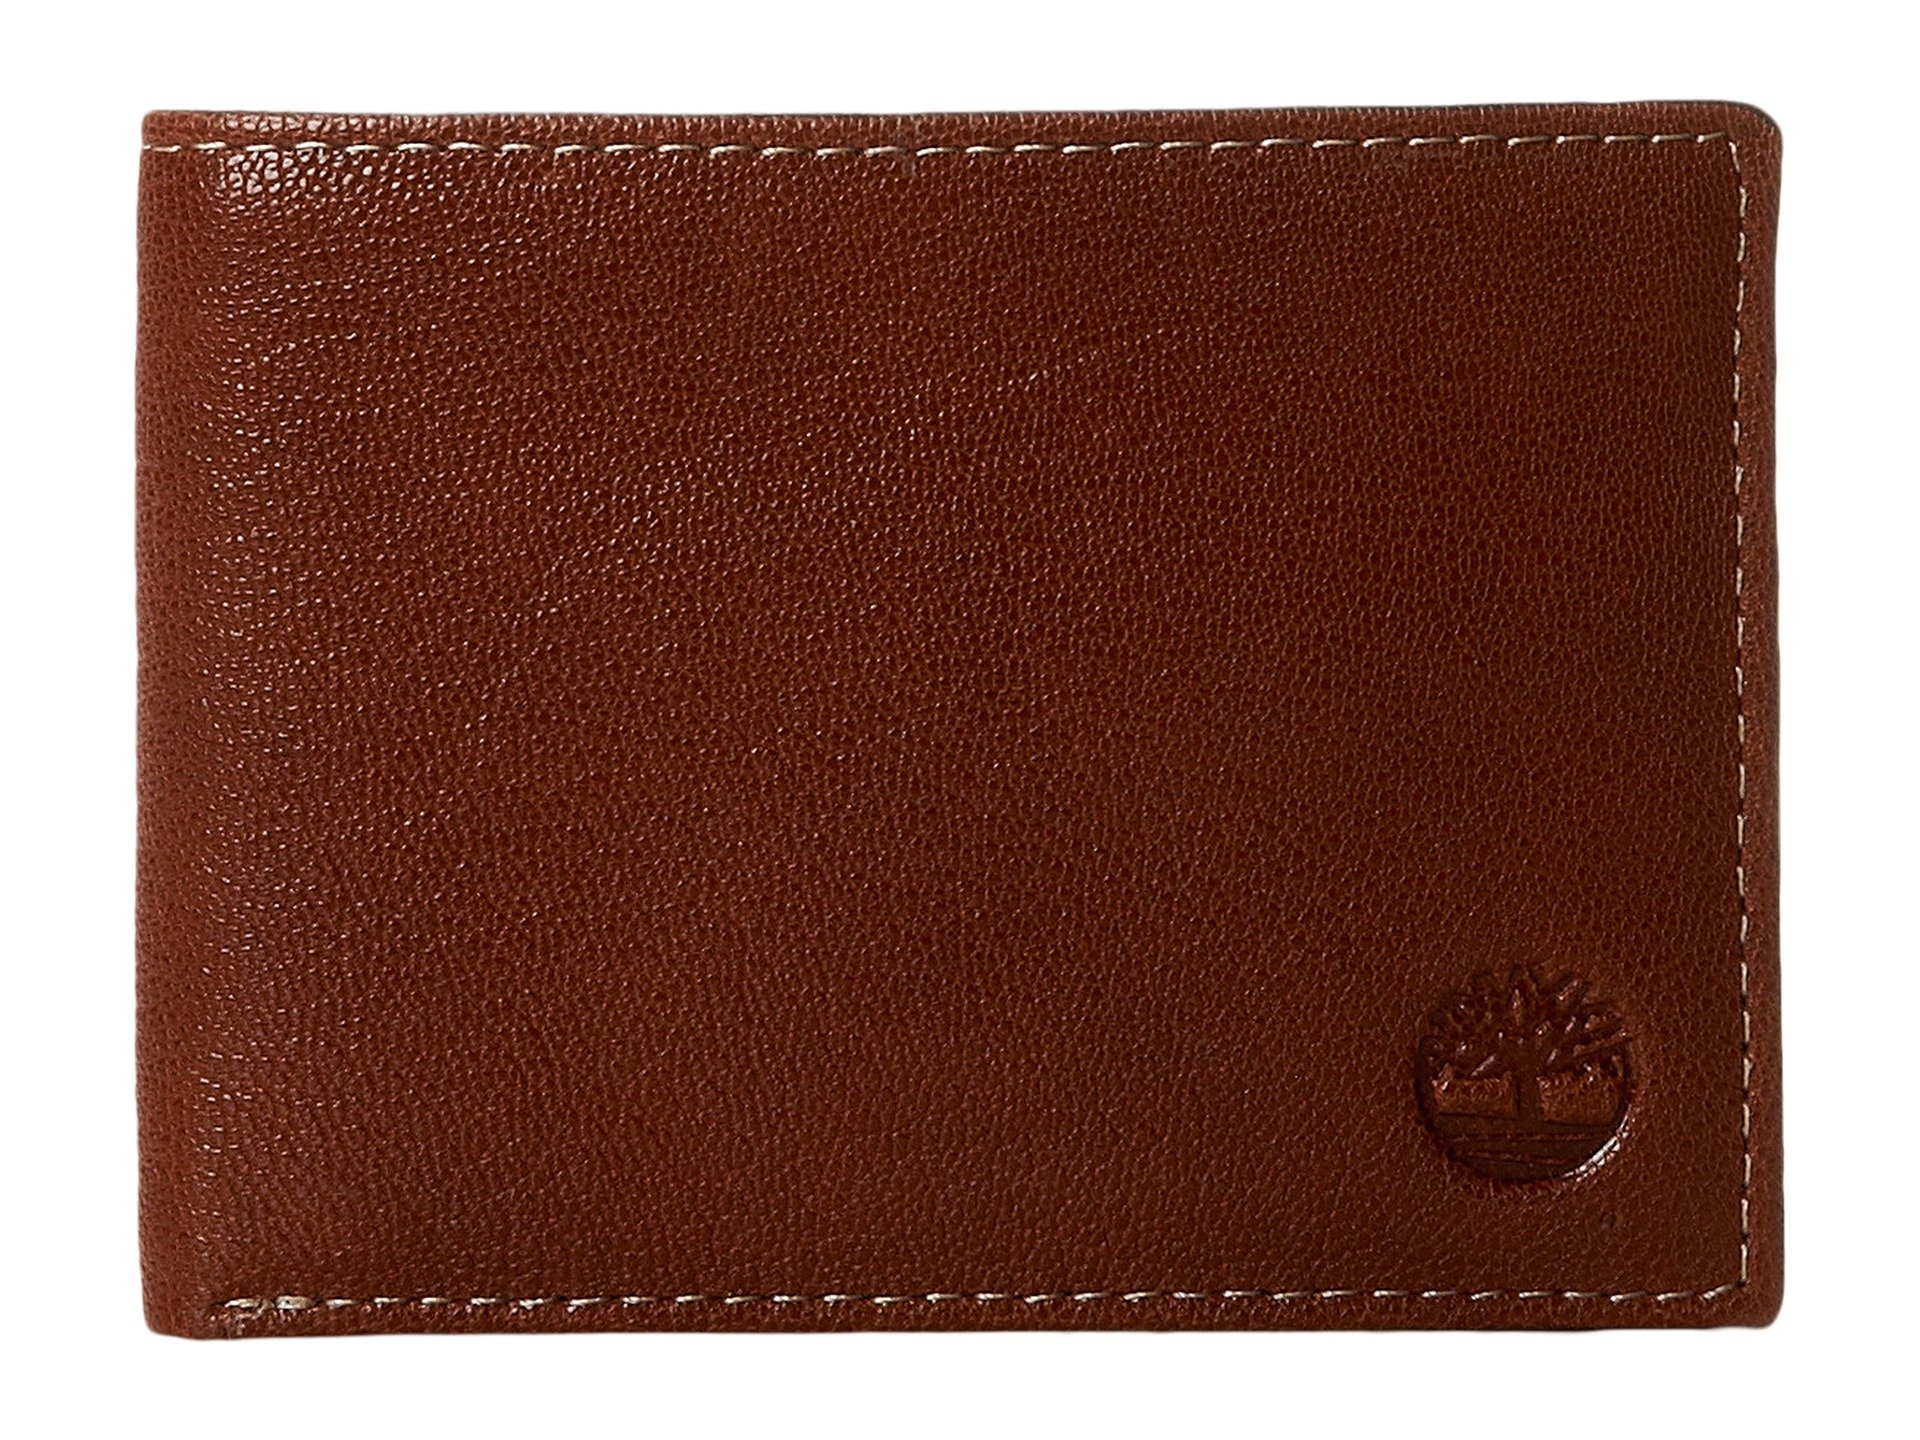 Billetera para Hombre Timberland Cavalieri Leather Passcase Wallet  + Timberland en VeoyCompro.net